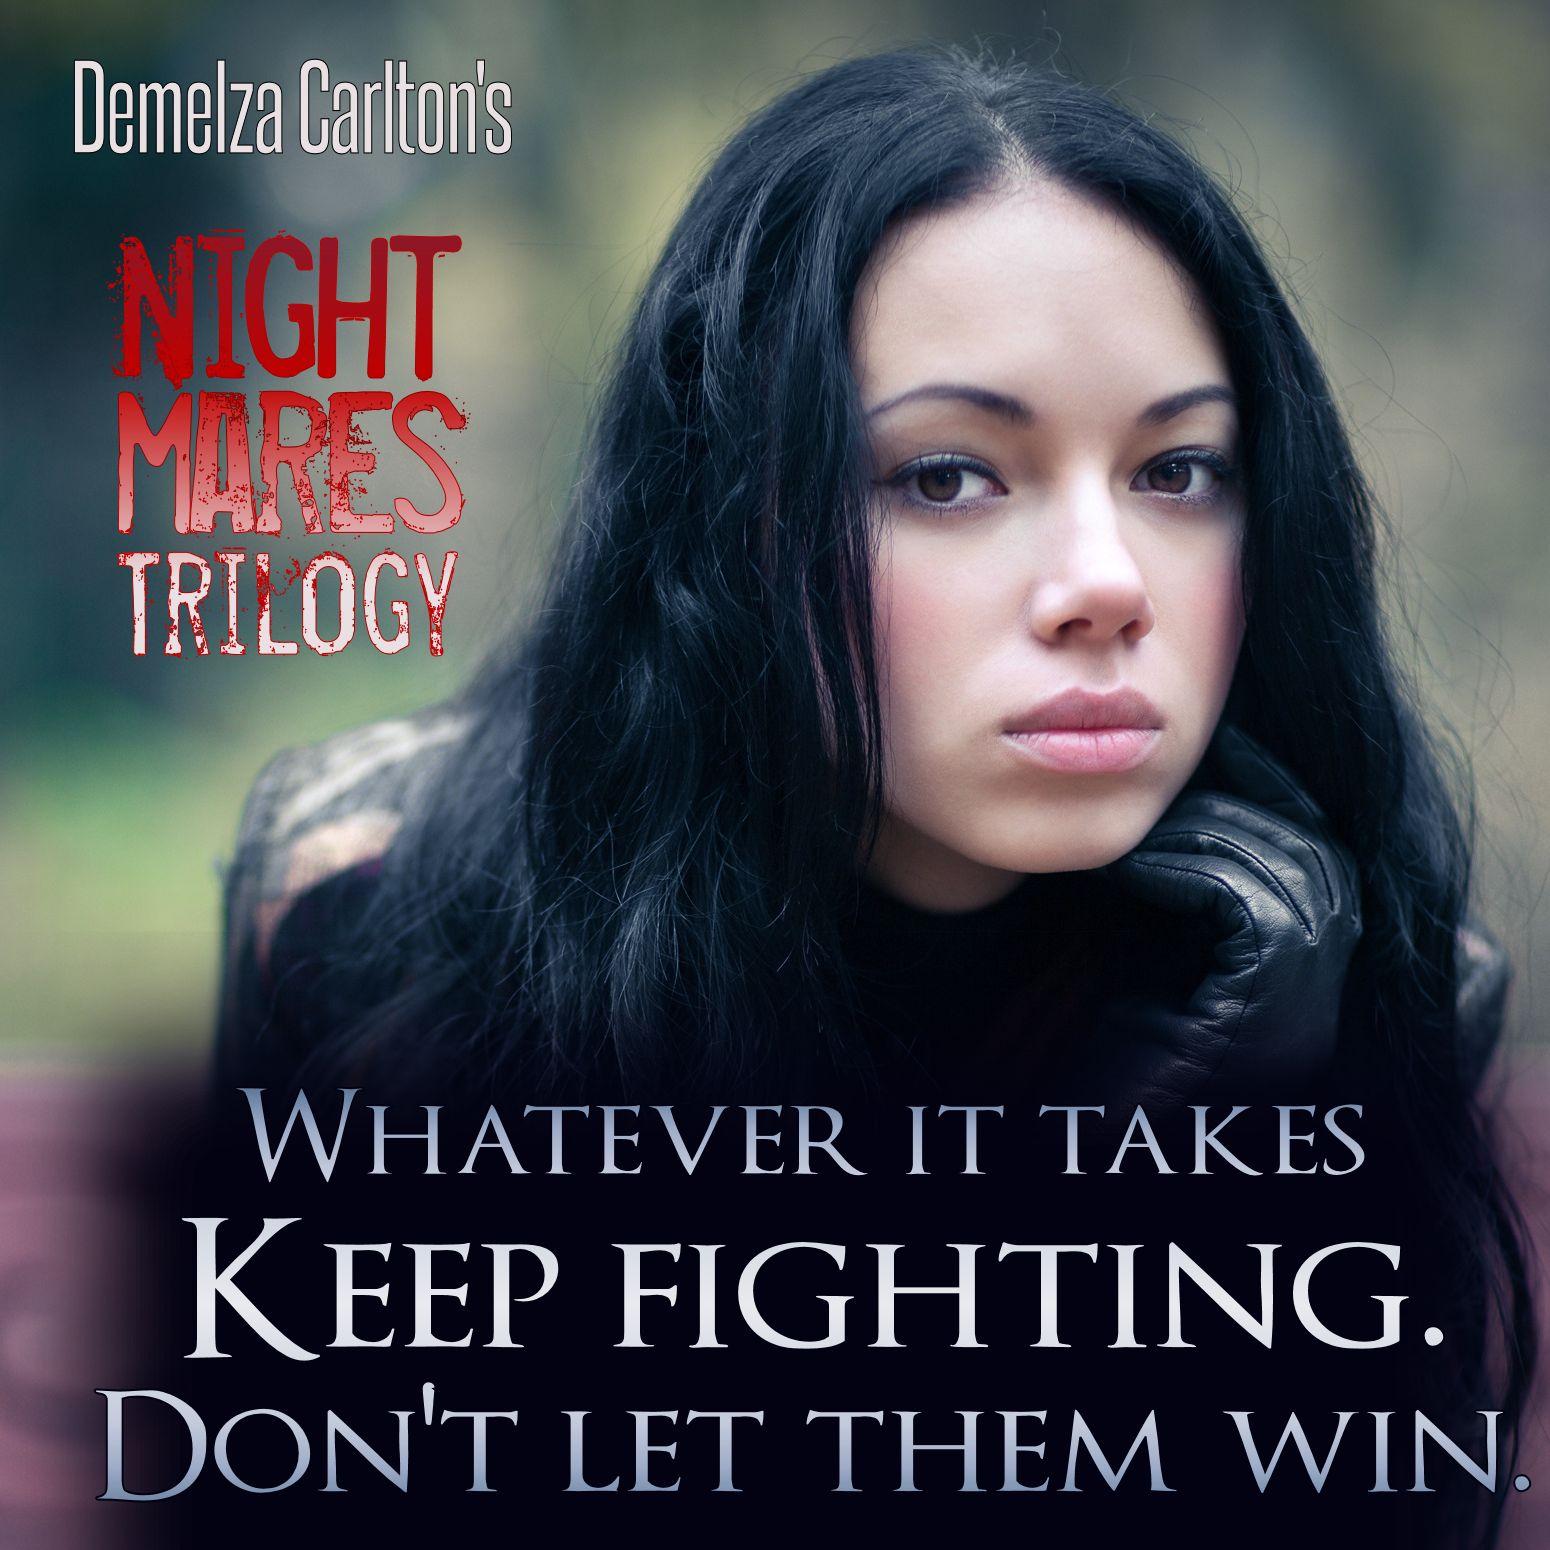 Caitlin Don't let them win.jpg